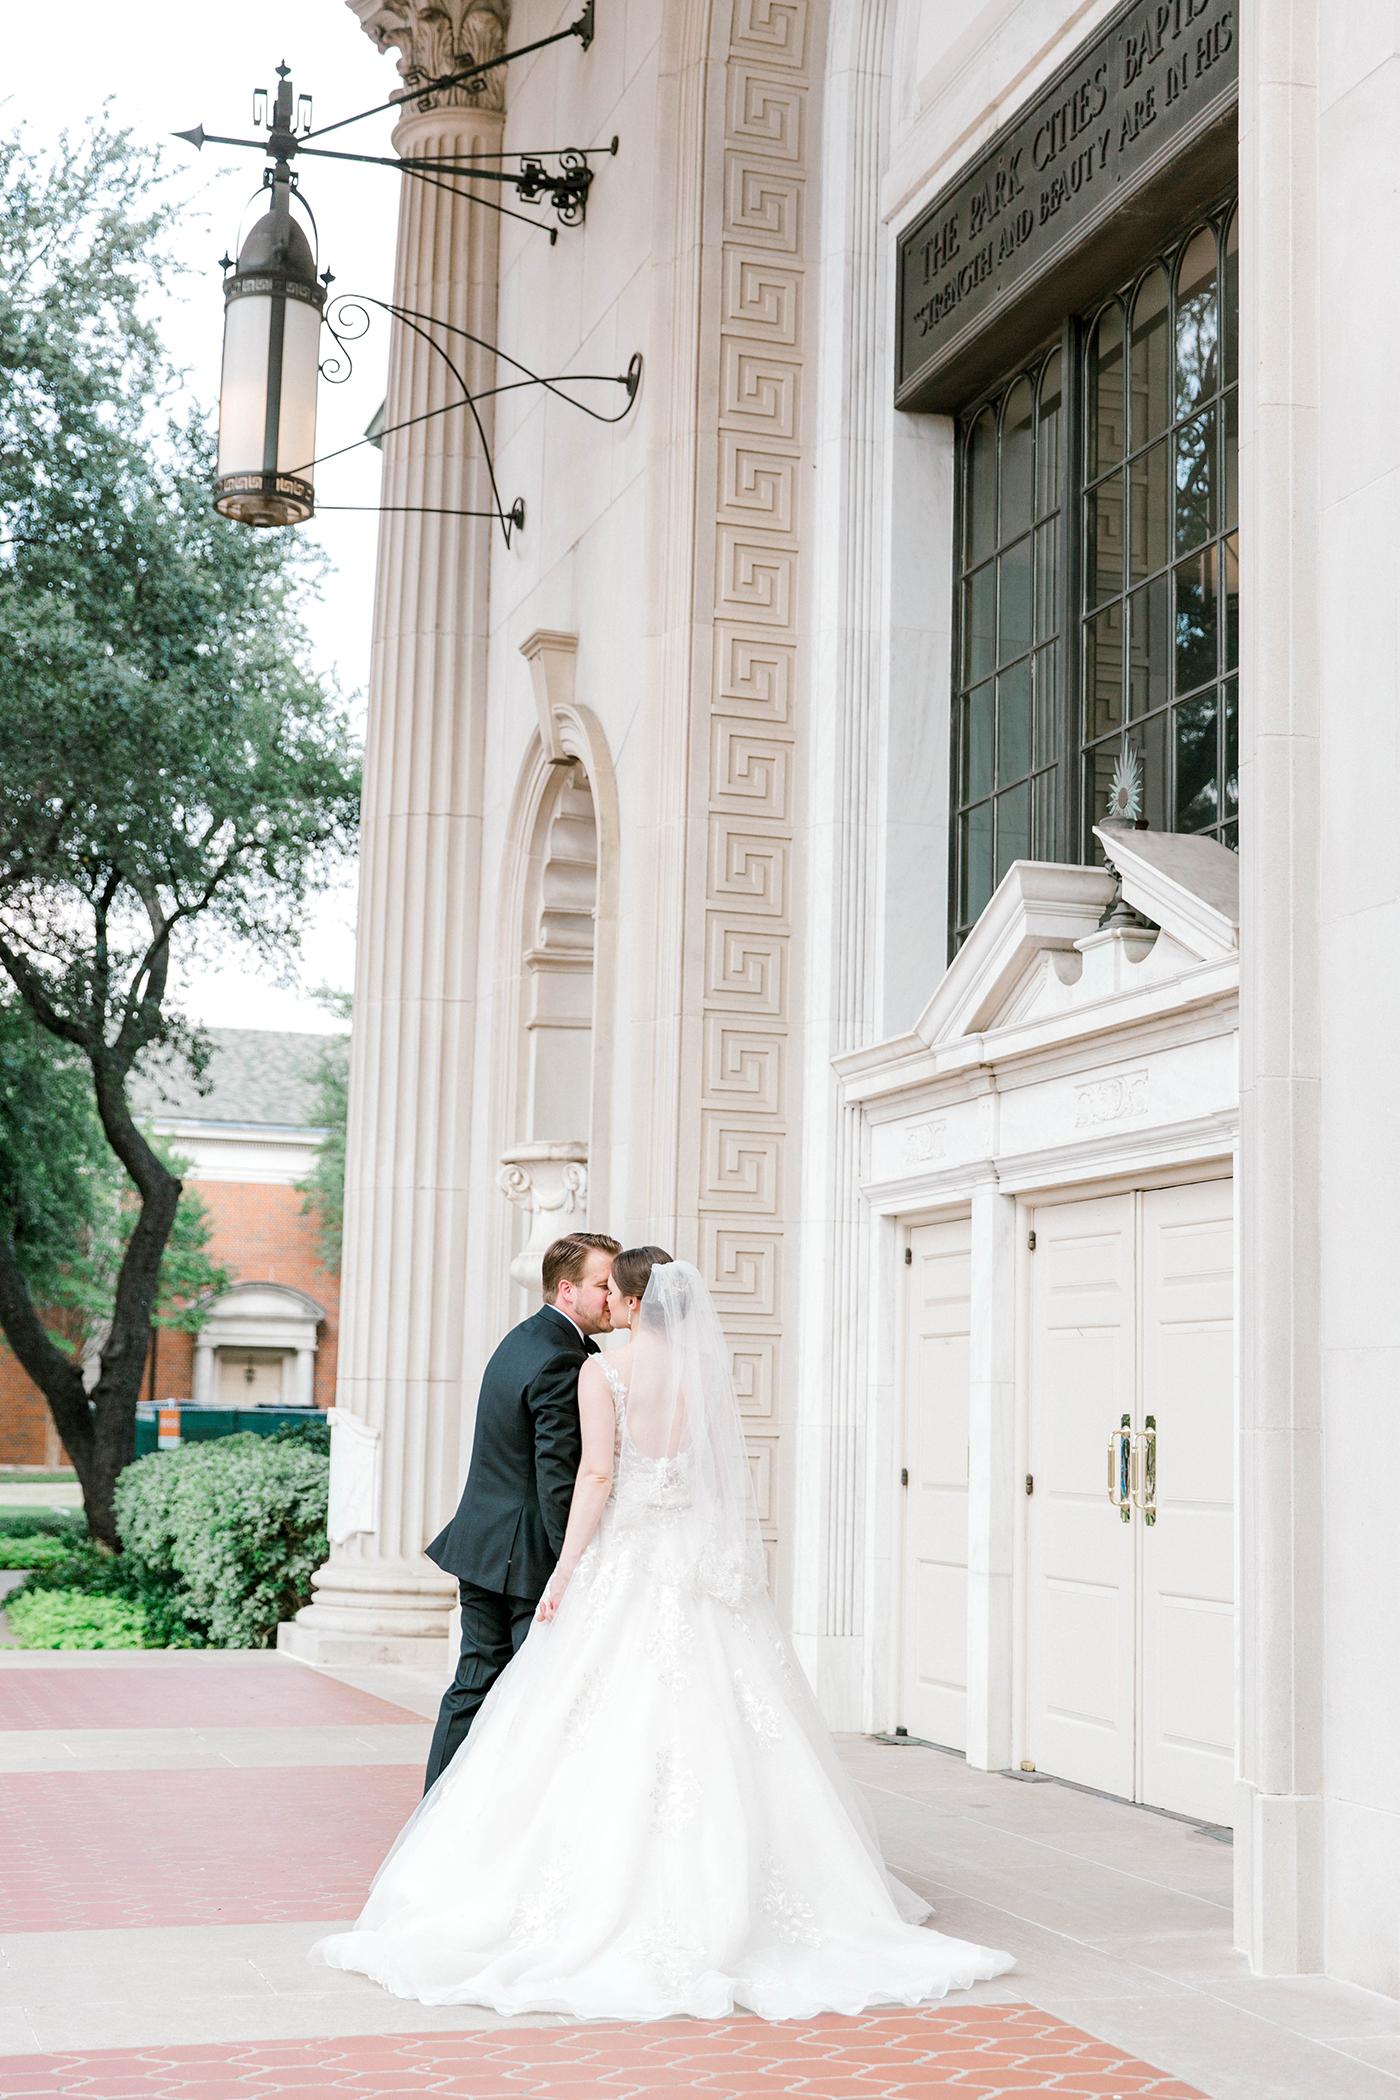 Dallas TX Wedding Planner - Allday Events - Hall on Dragon Wedding - 00097.jpg